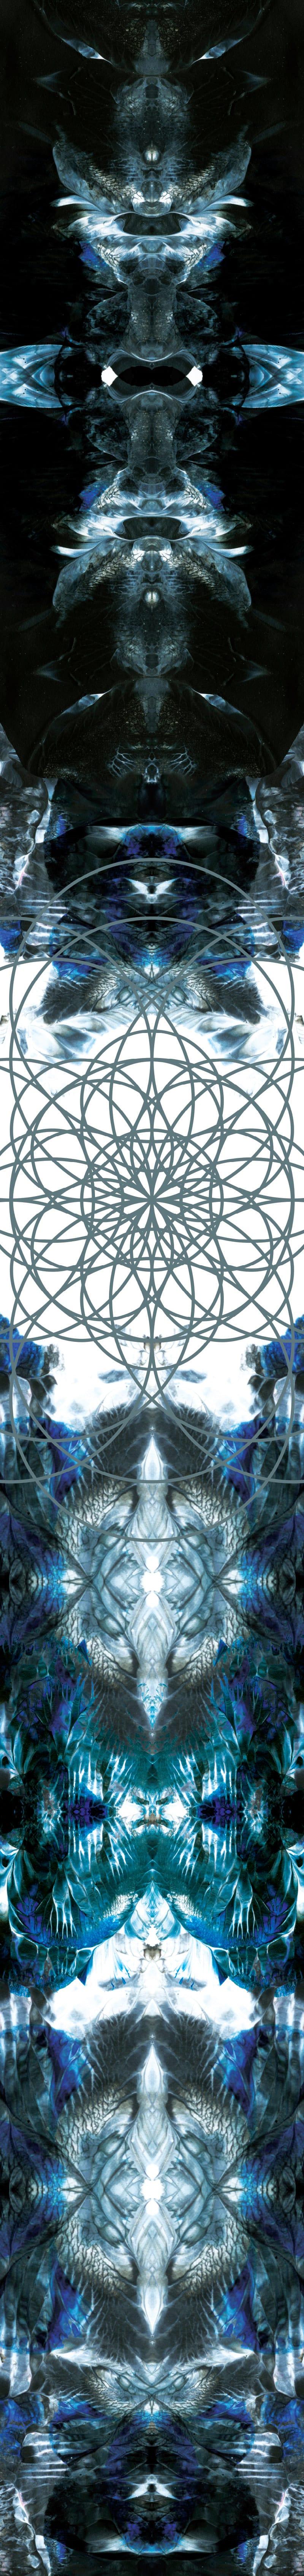 Life beyond earth at NTU ADM Portfolio